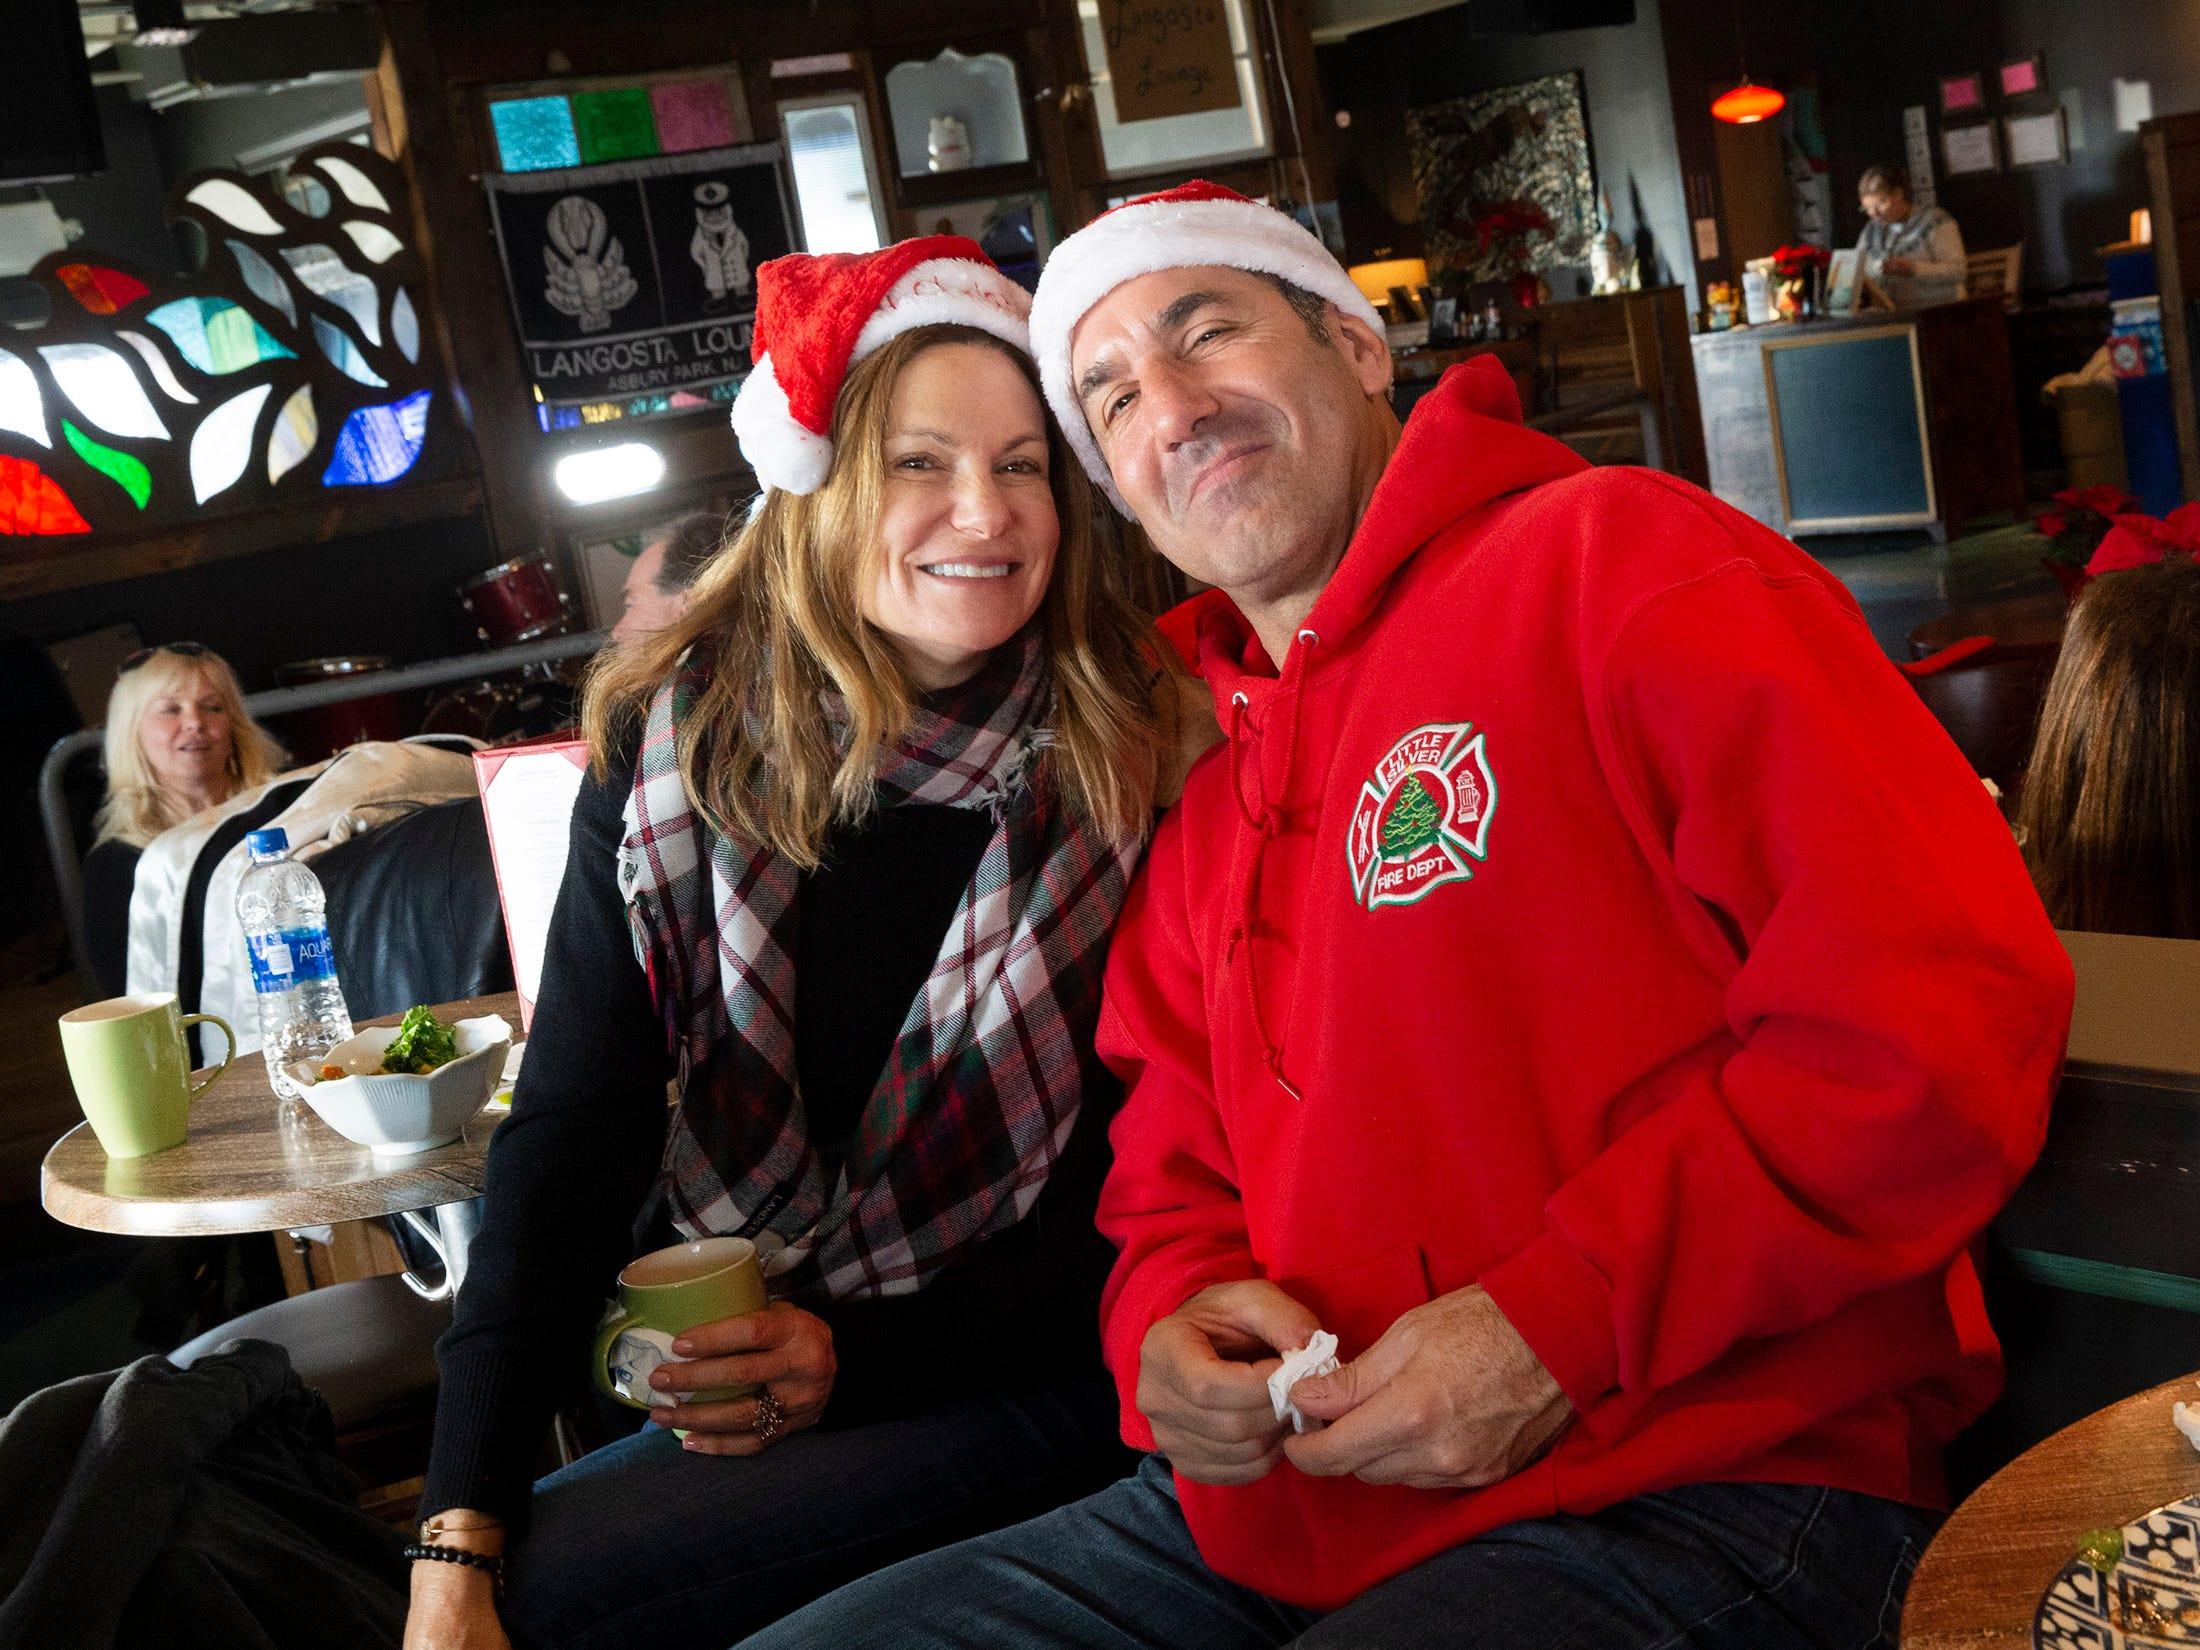 Kimberly Sokol and Brian Paris of Asbury Park enjoy at the Langosta Lounge during SantaCon Crawl through Asbury Park on December 8, 2018.